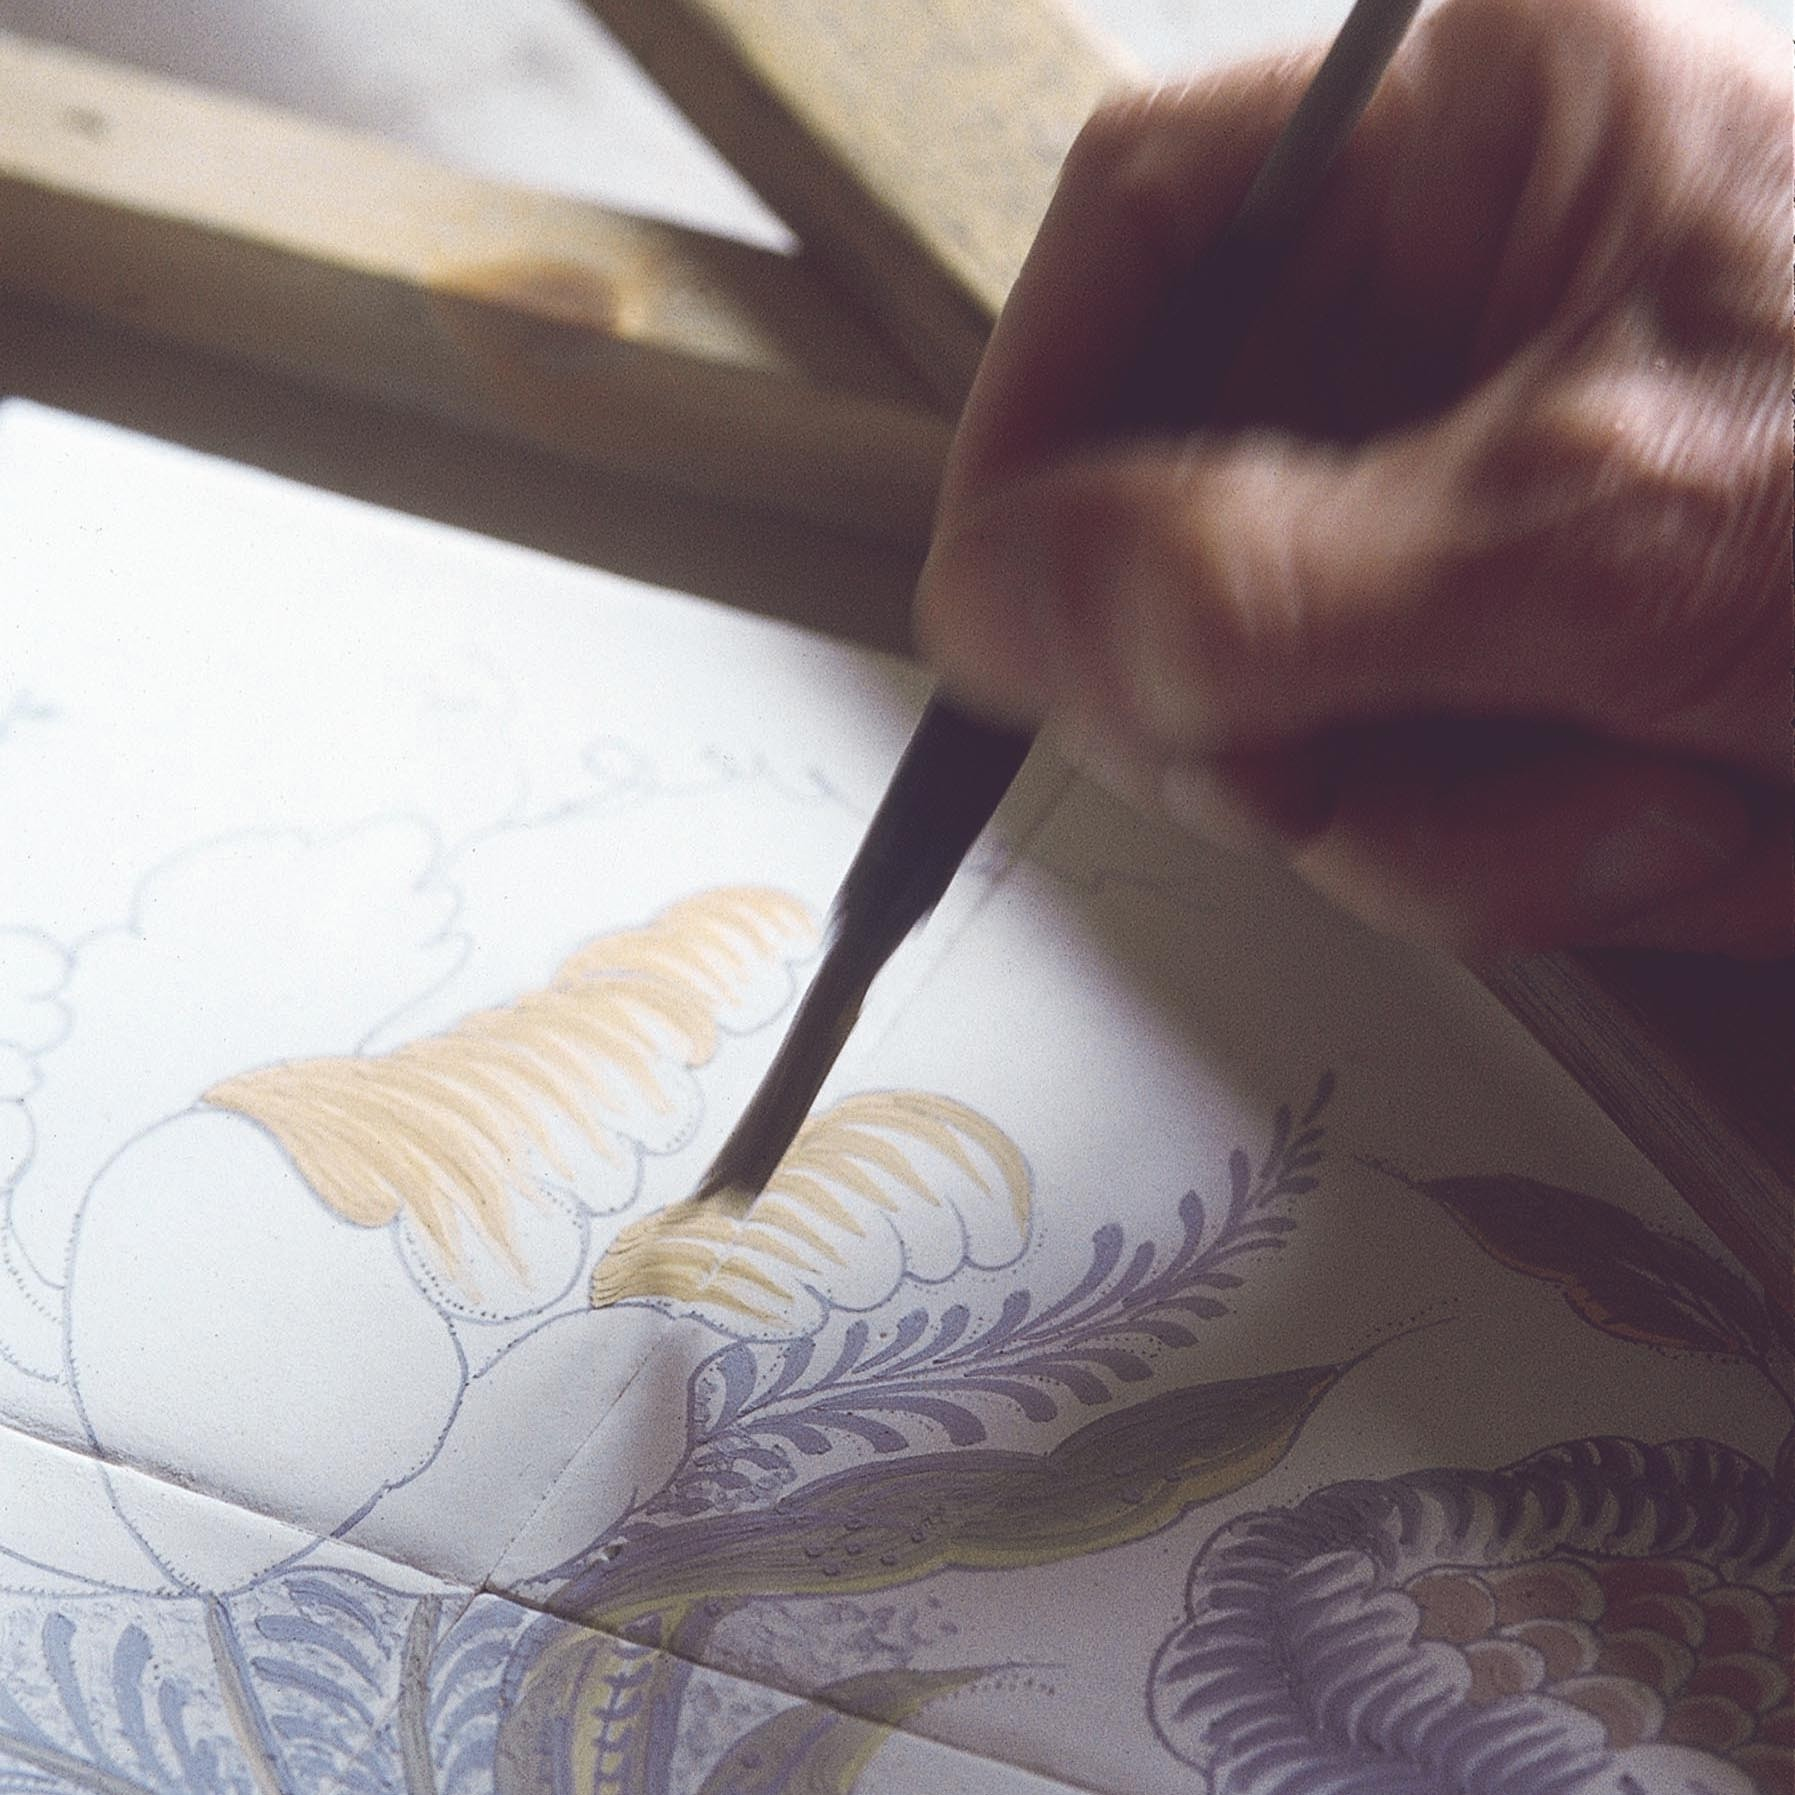 Handbemalte Wandfliesen